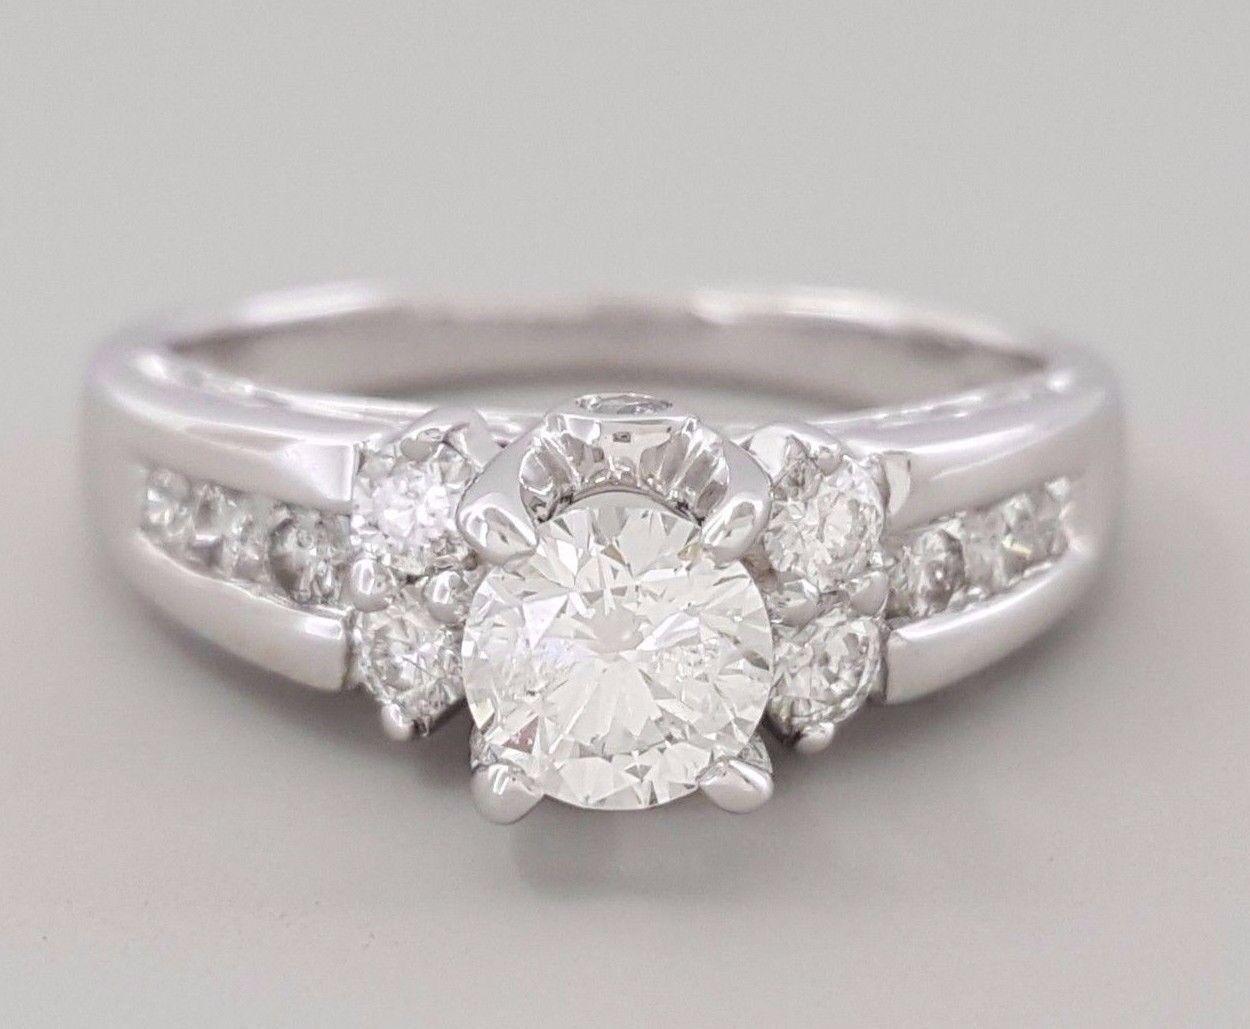 0.77 ct 14k White gold Round Brilliant Cut Diamond Engagement Ring